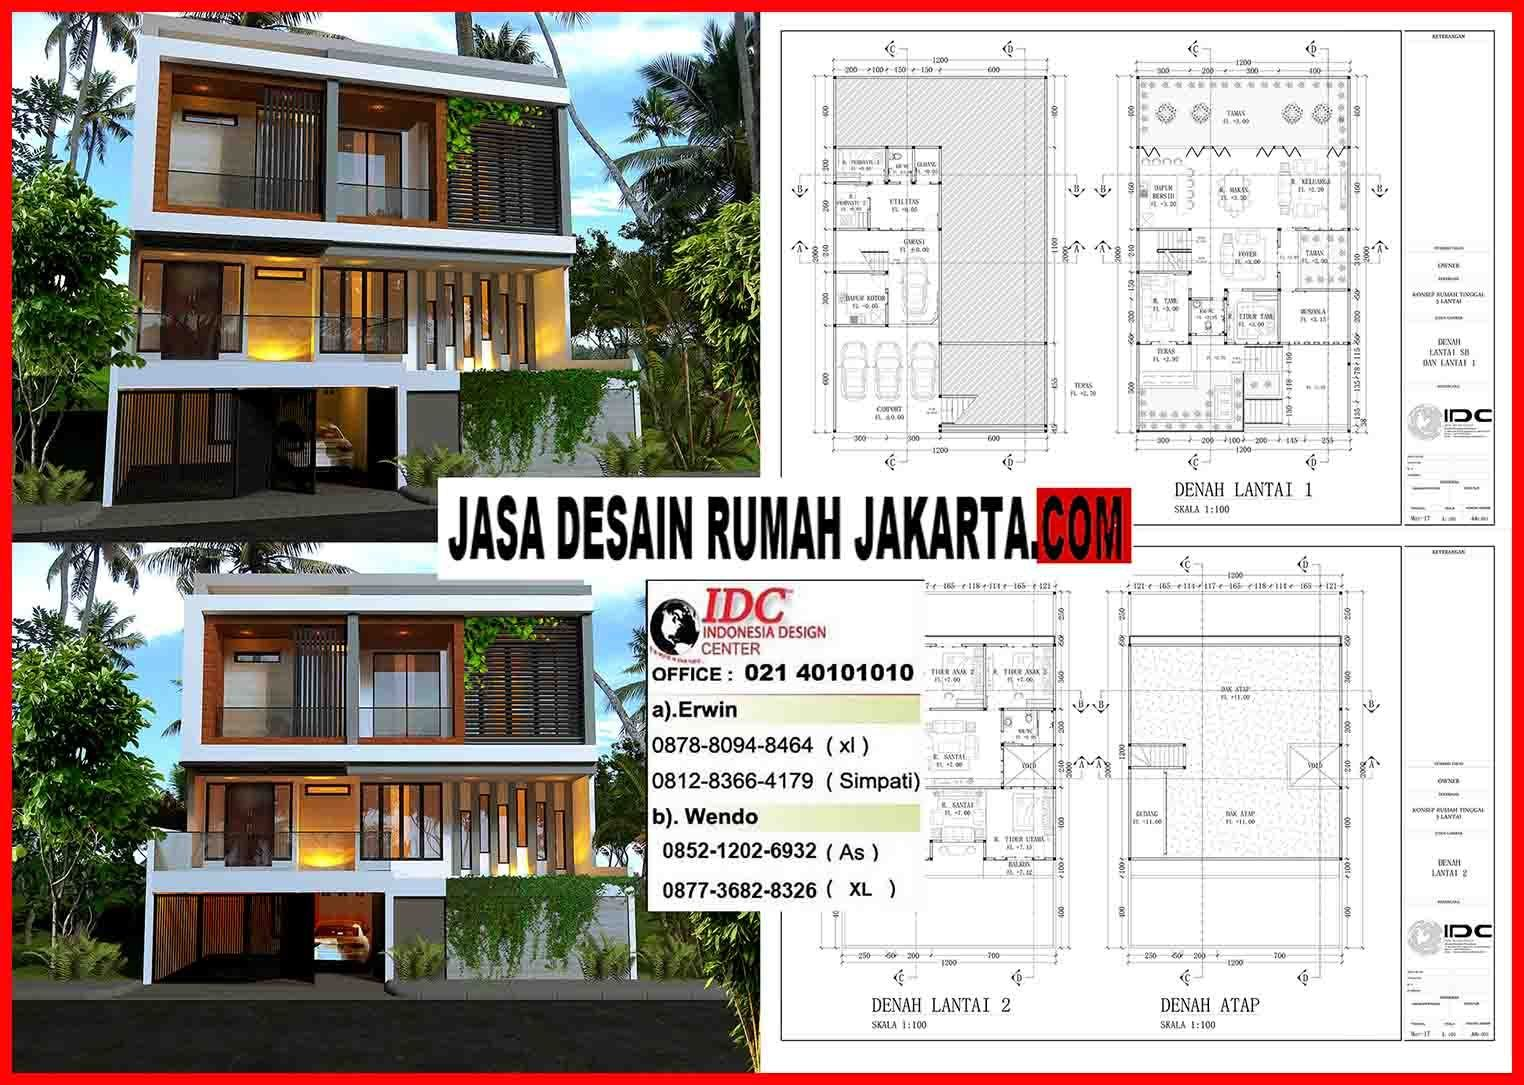 Desain Rumah Modern Kontemporer 2 Lantai Desain Rumah Kecil Desain Rumah Desain Rumah Kontemporer